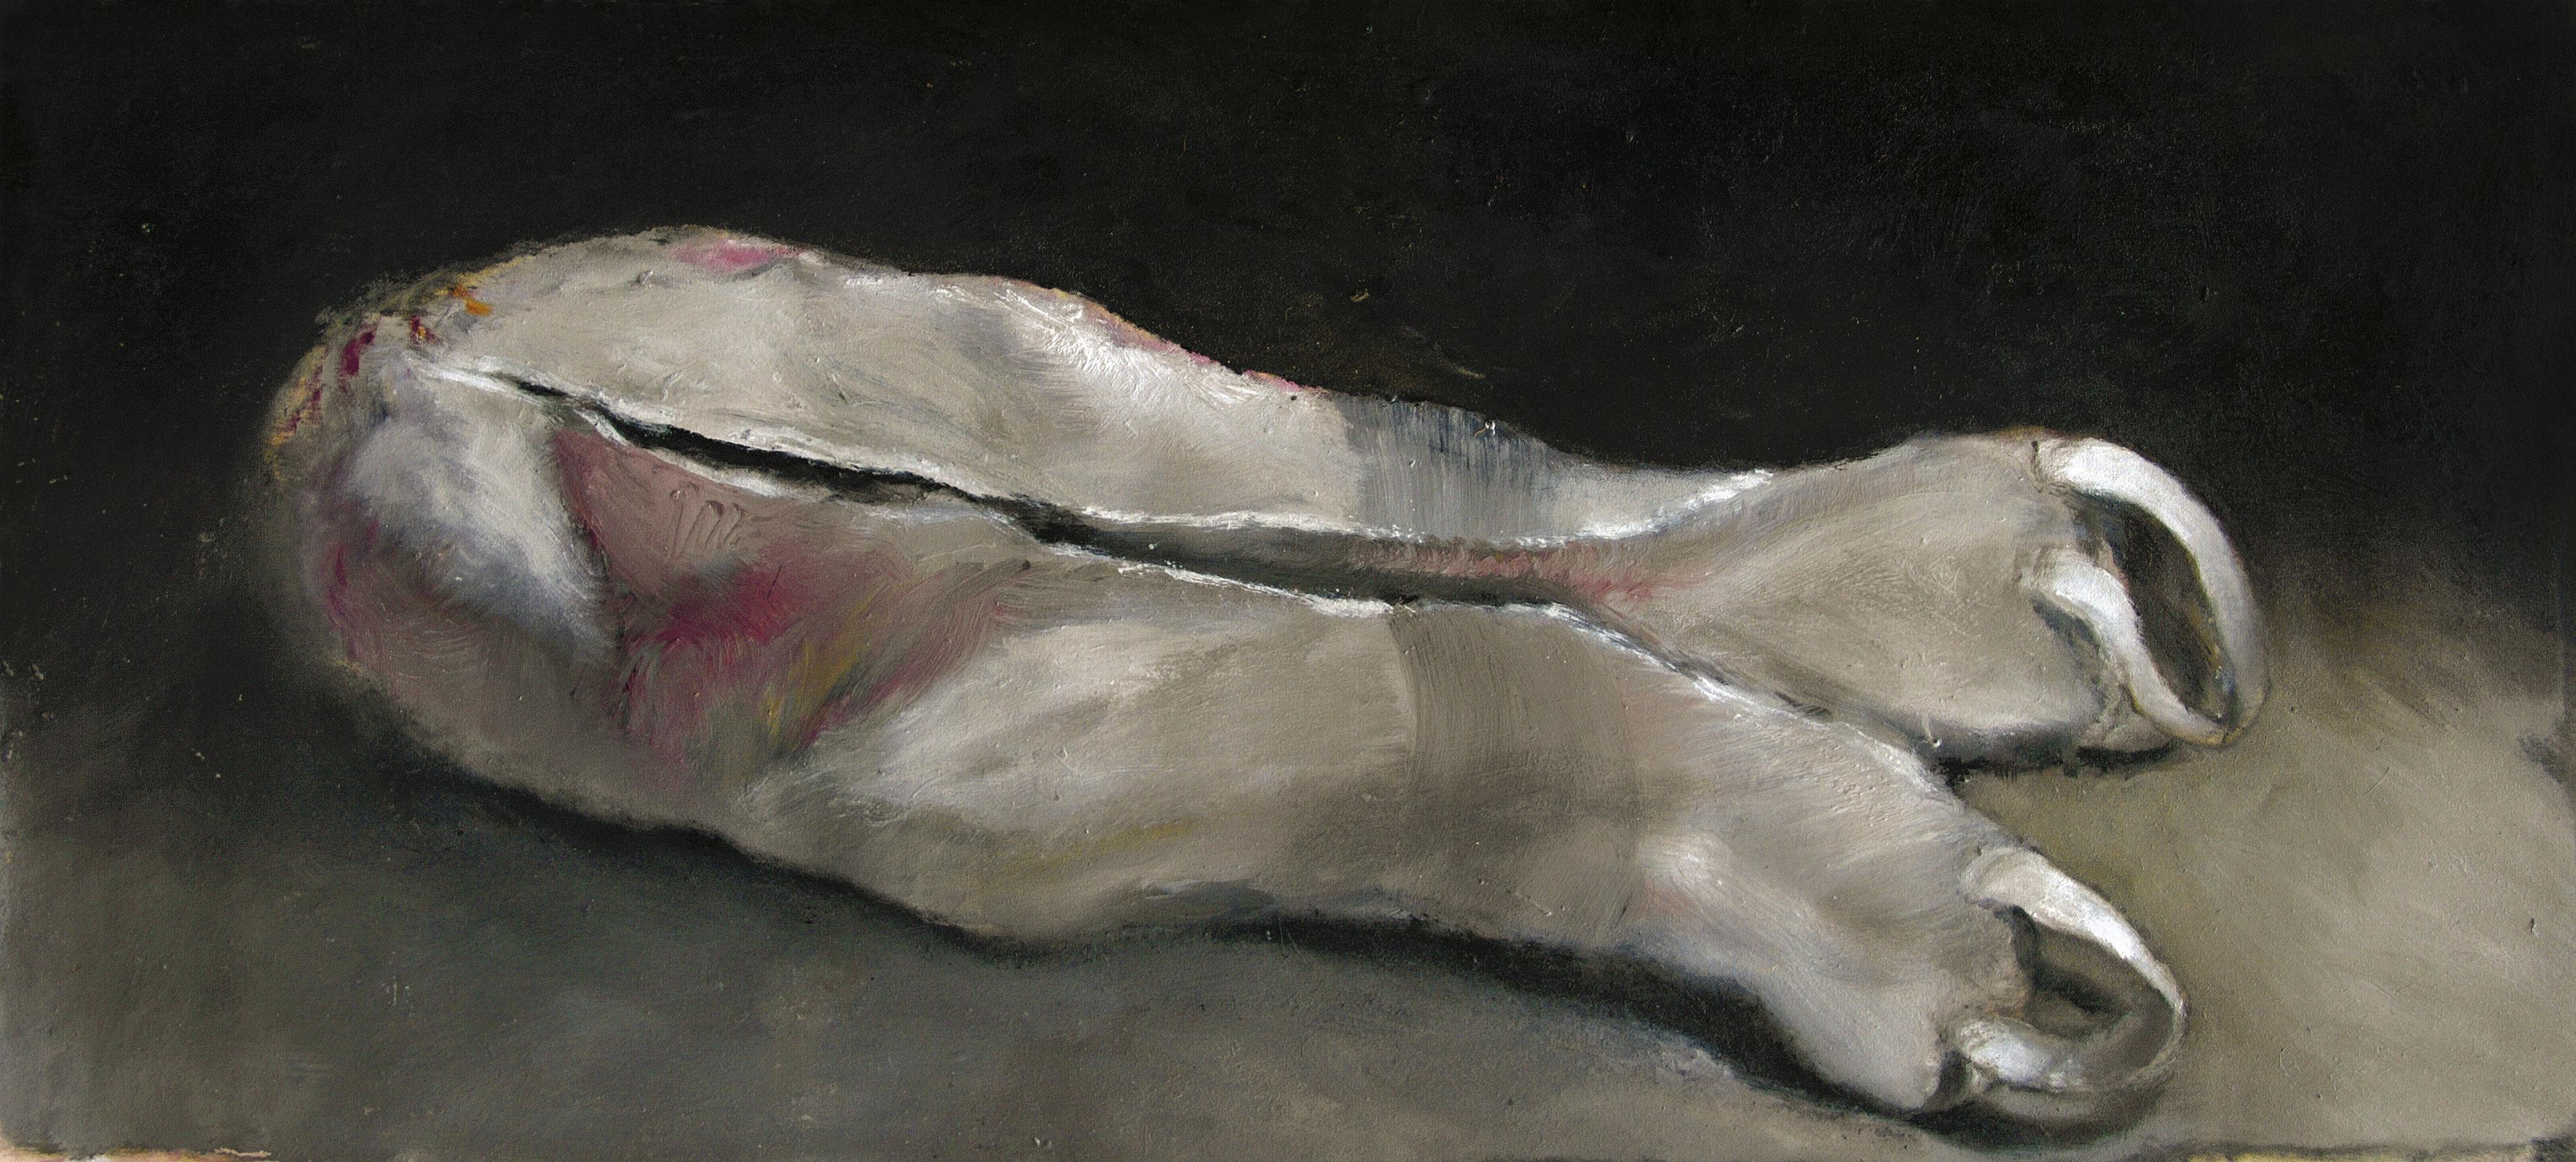 2008-body-bag-6